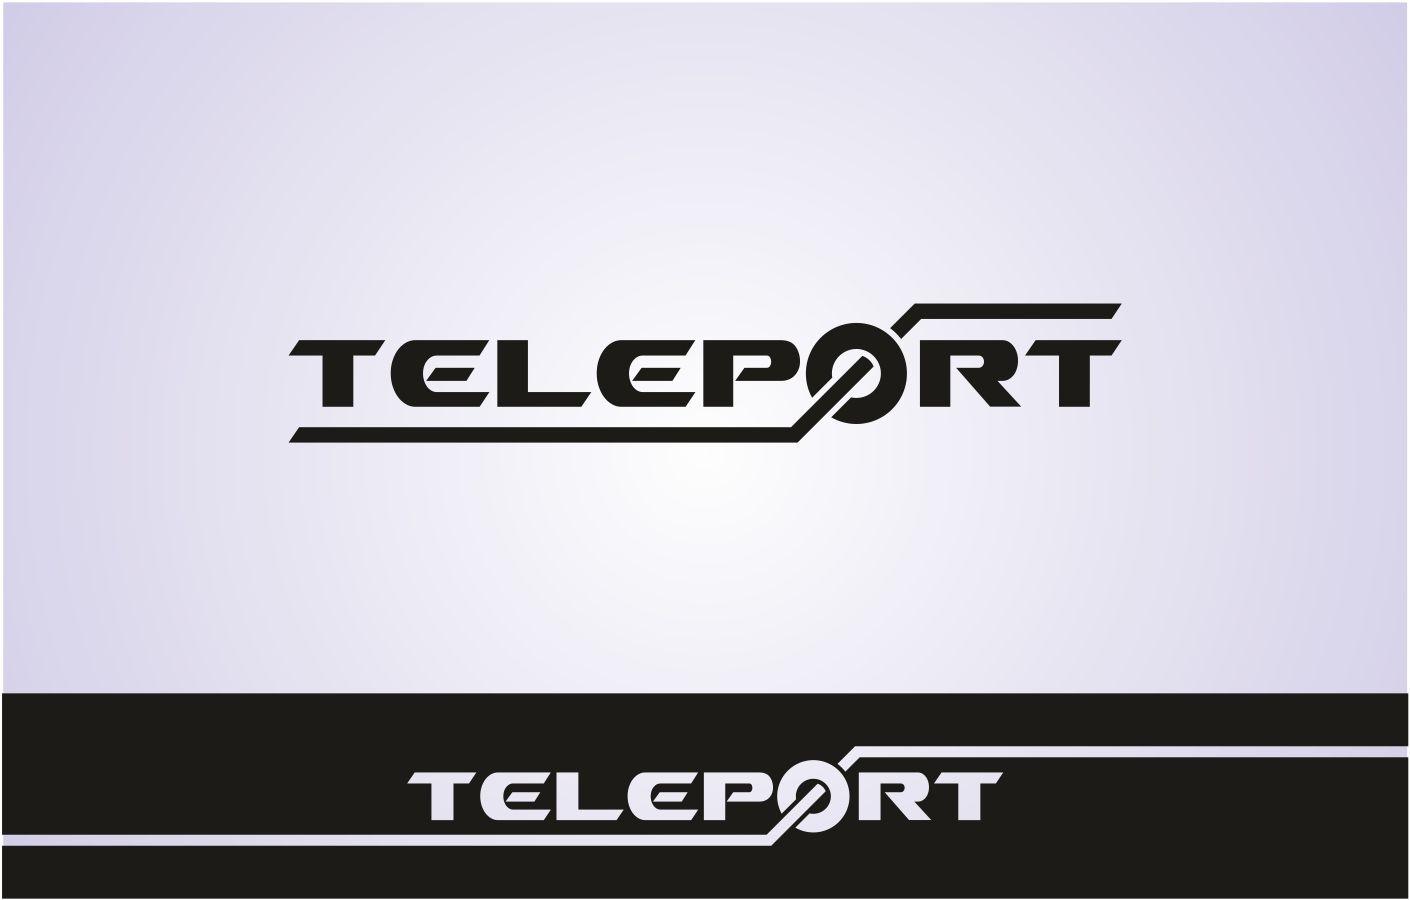 Логотип для Телепорт - дизайнер graphin4ik